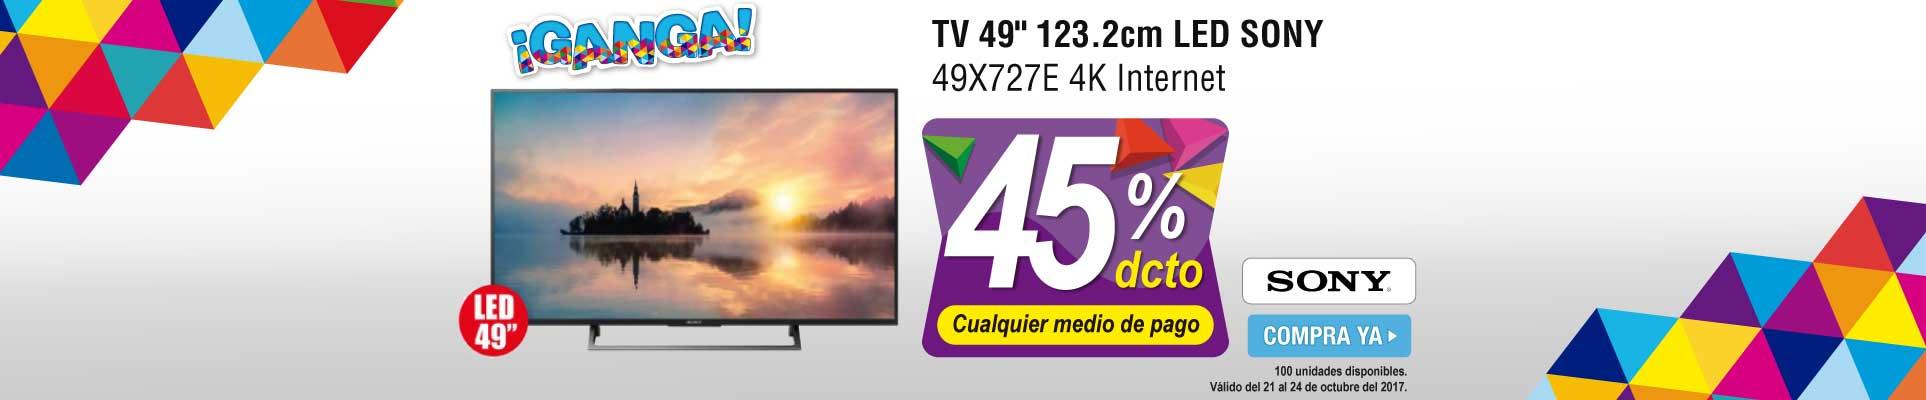 PPAL ALKP-4-tv-TV 49 123.2cm LED SONY 49X727E 4K Internet-prod-octubre21-24